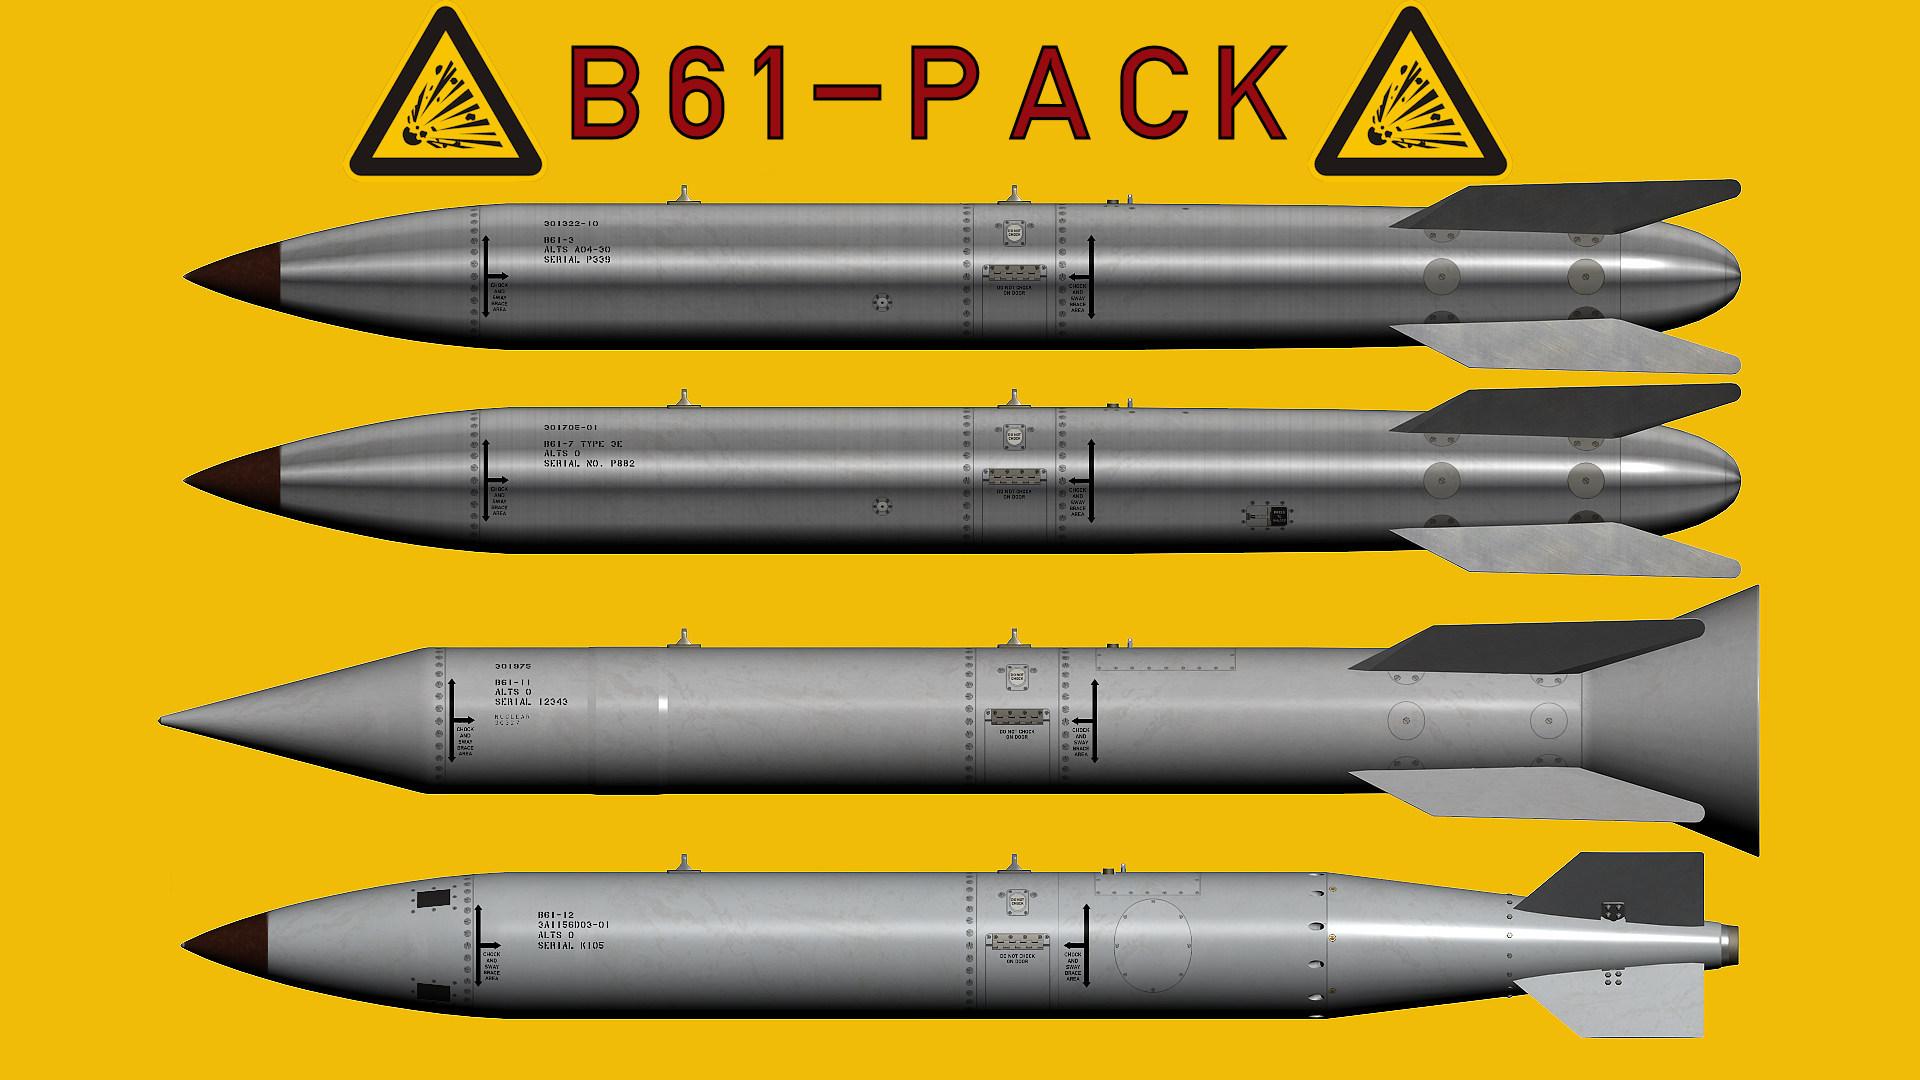 B61 Nuclear Bomb Pack